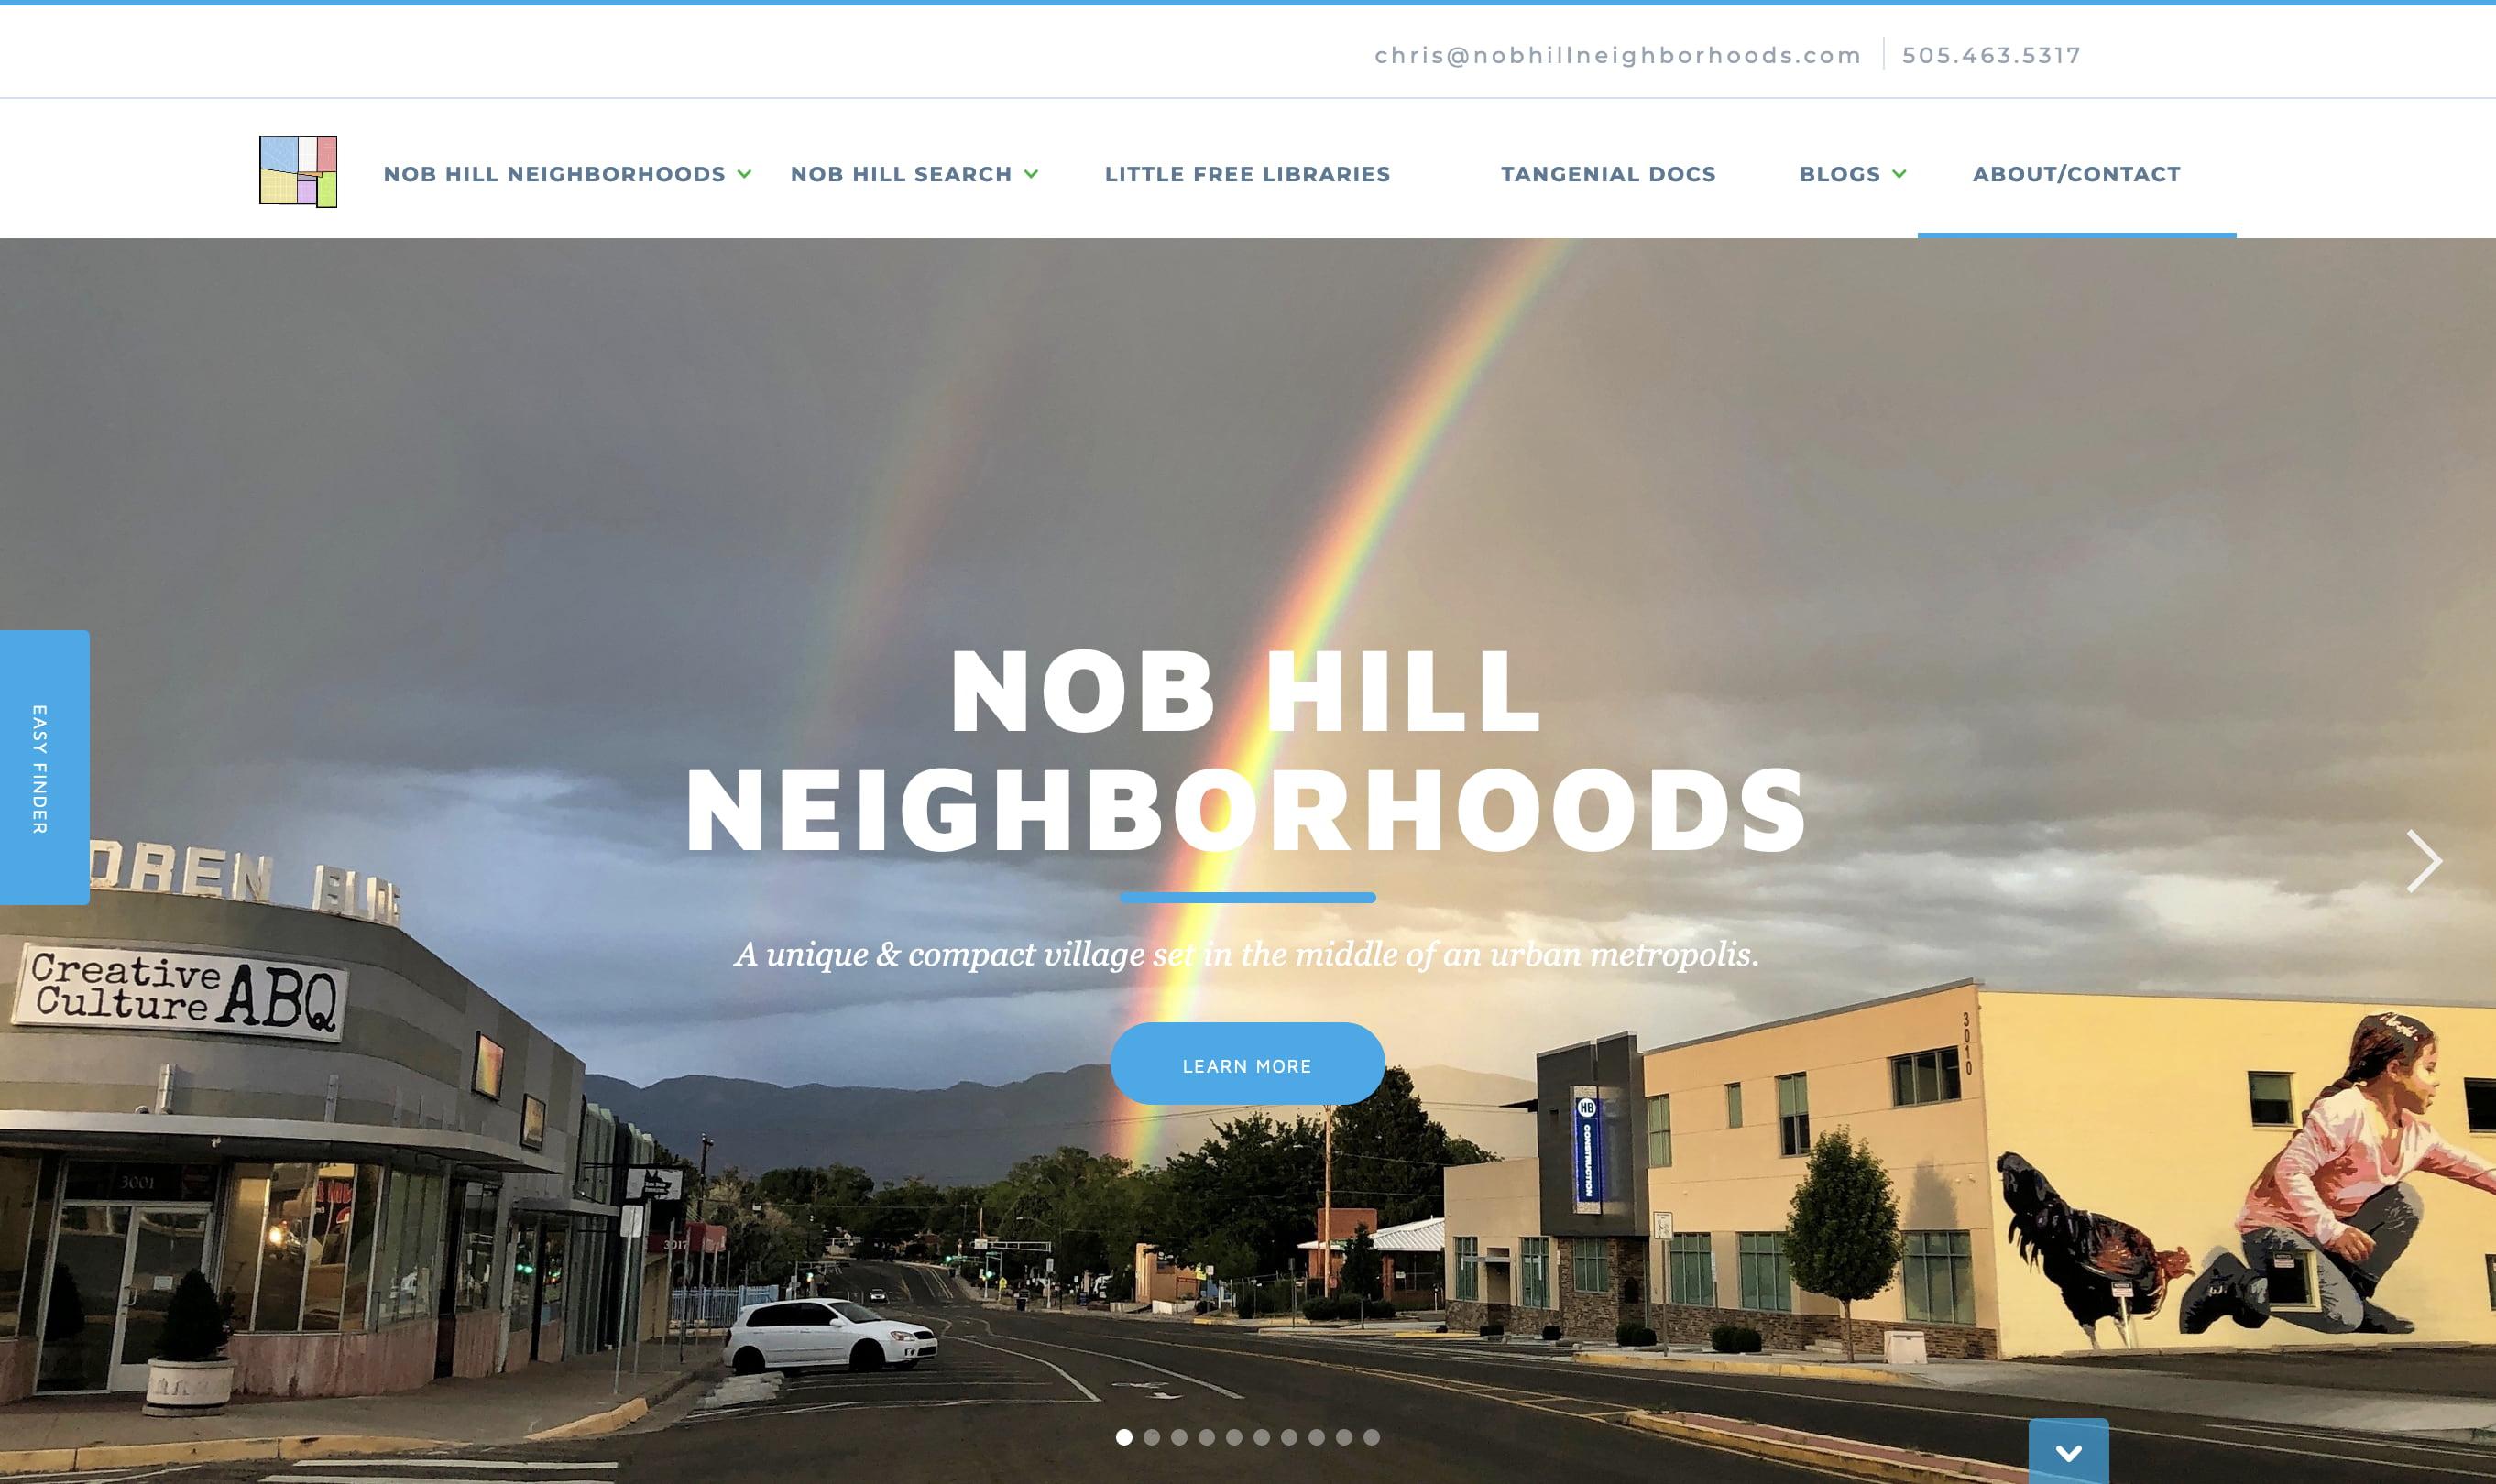 Nob Hill Neighborhoods